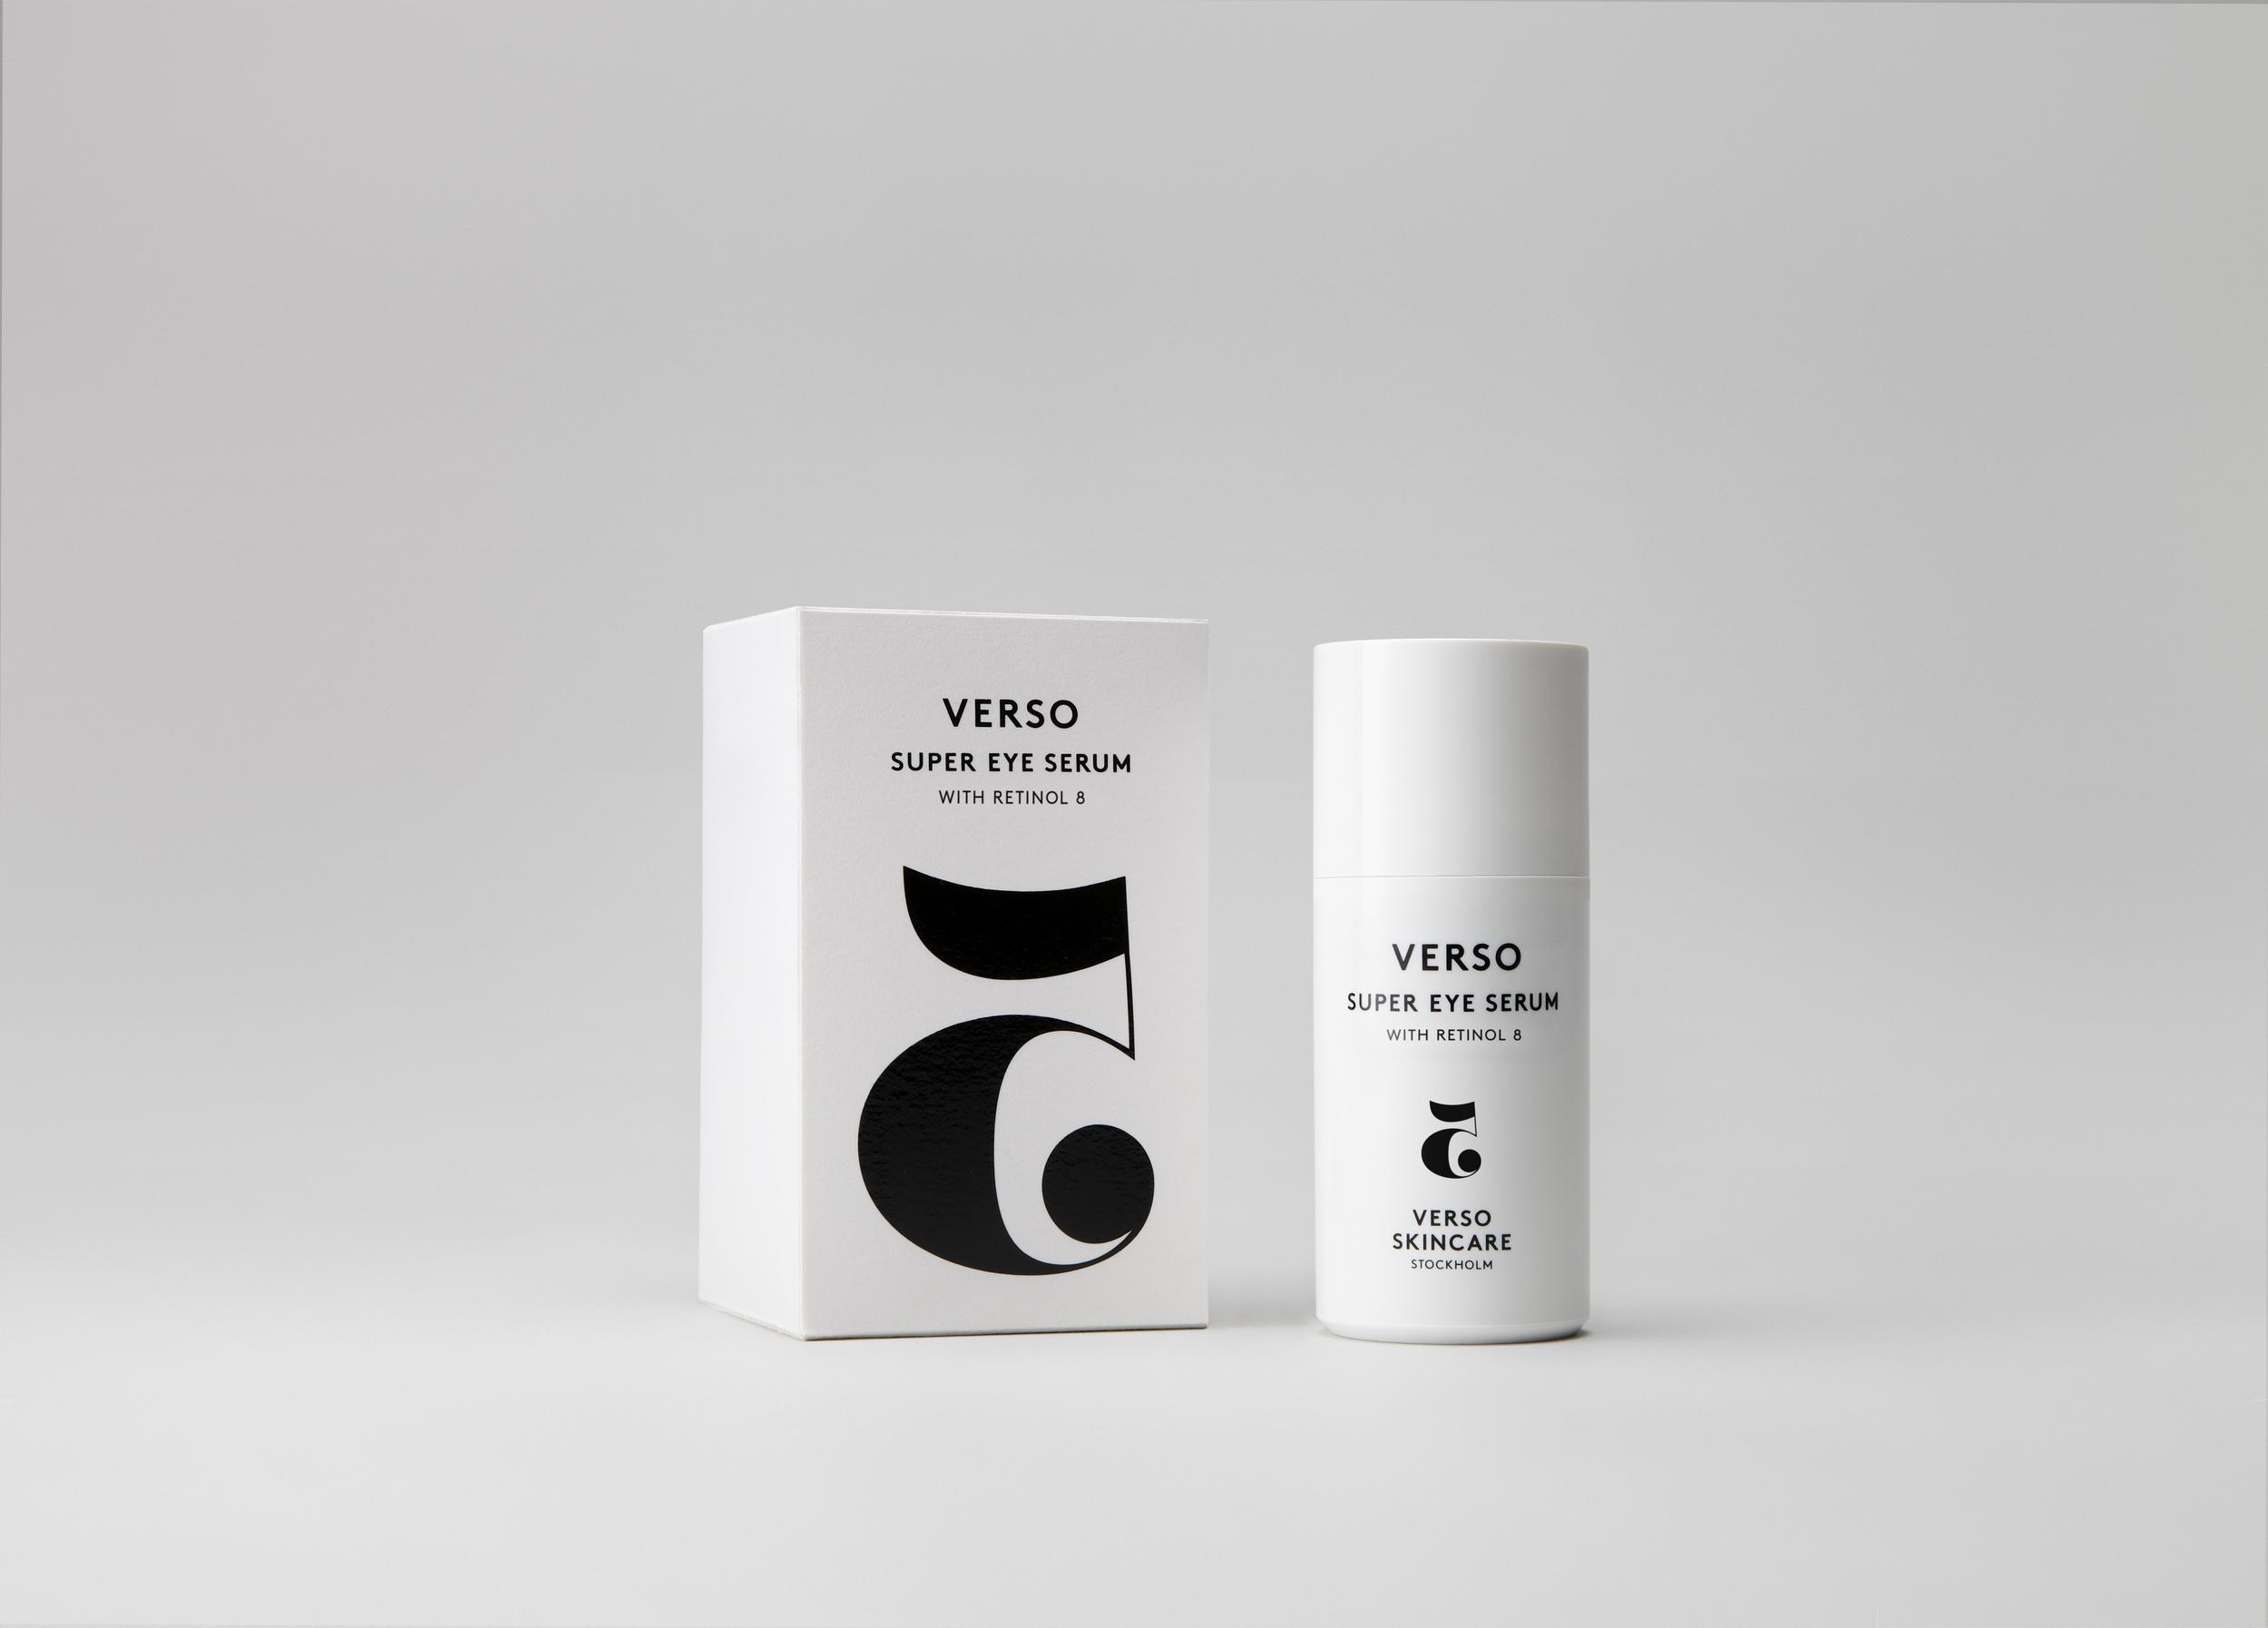 Verso Skincare Product 5